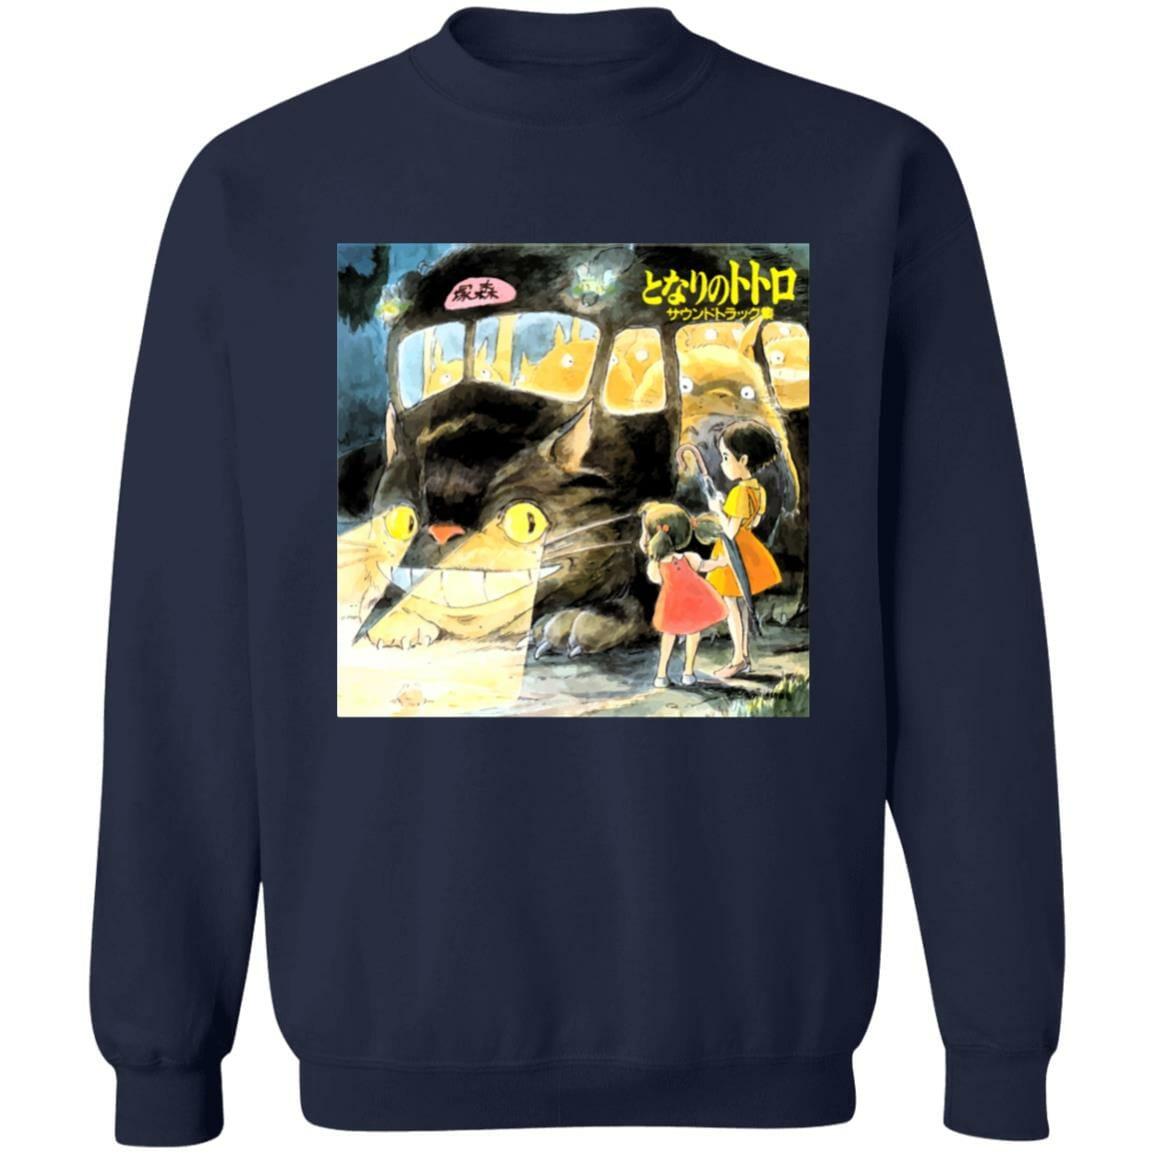 My Neighbor Totoro – Midnight Cat Bus Sweatshirt Unisex